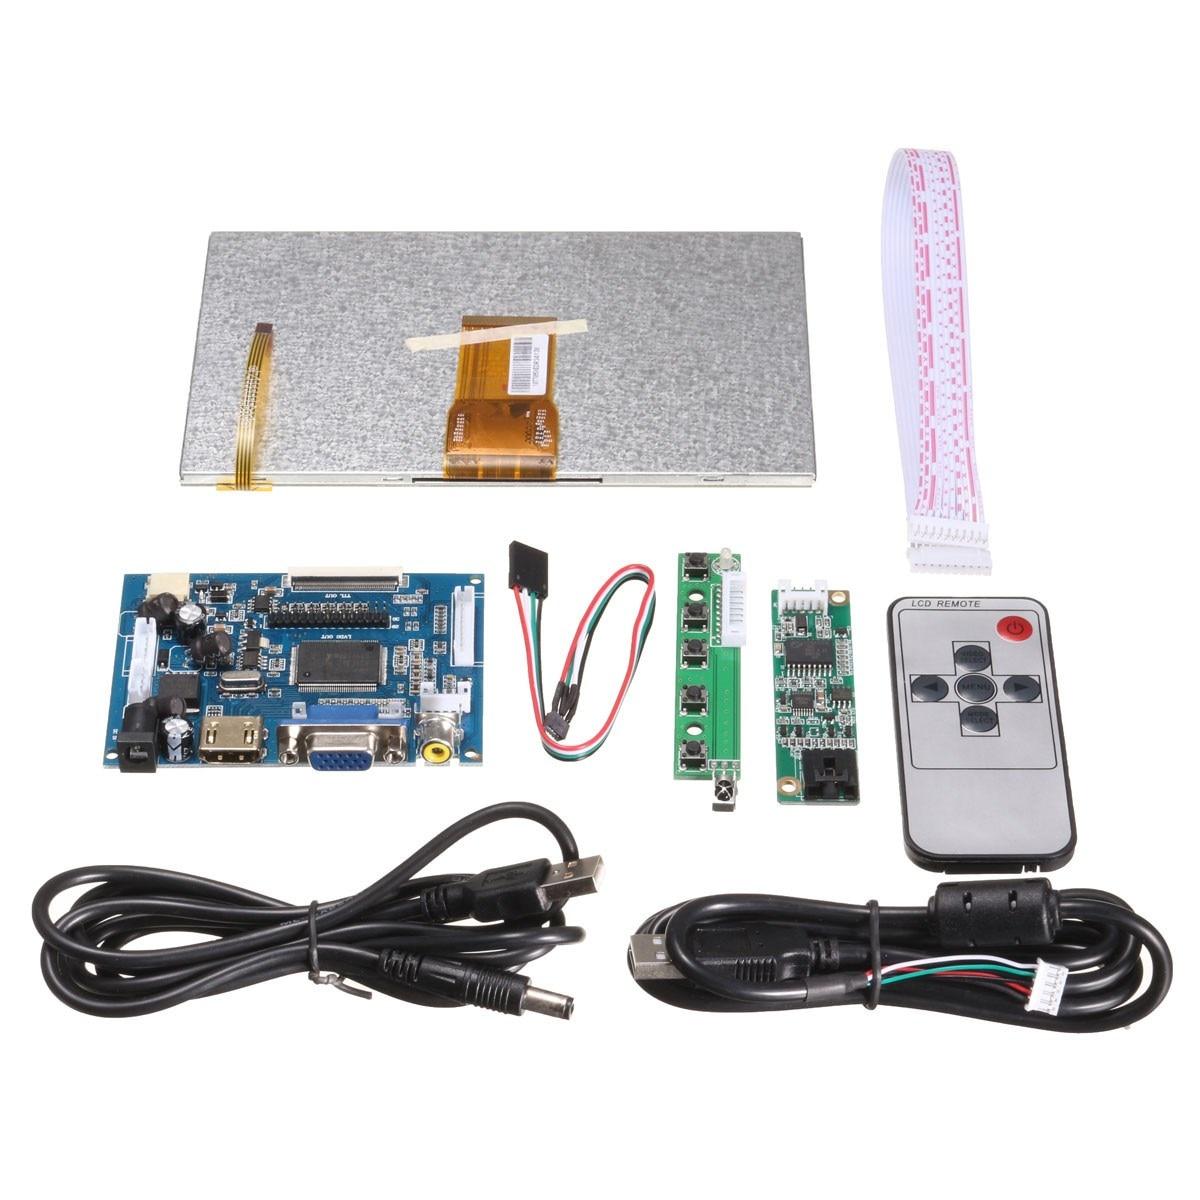 New 1Set Raspberry Pi 7 Inch Raspberry Pi LCD Touch Screen Display HDMI HD 1024x600 Touch